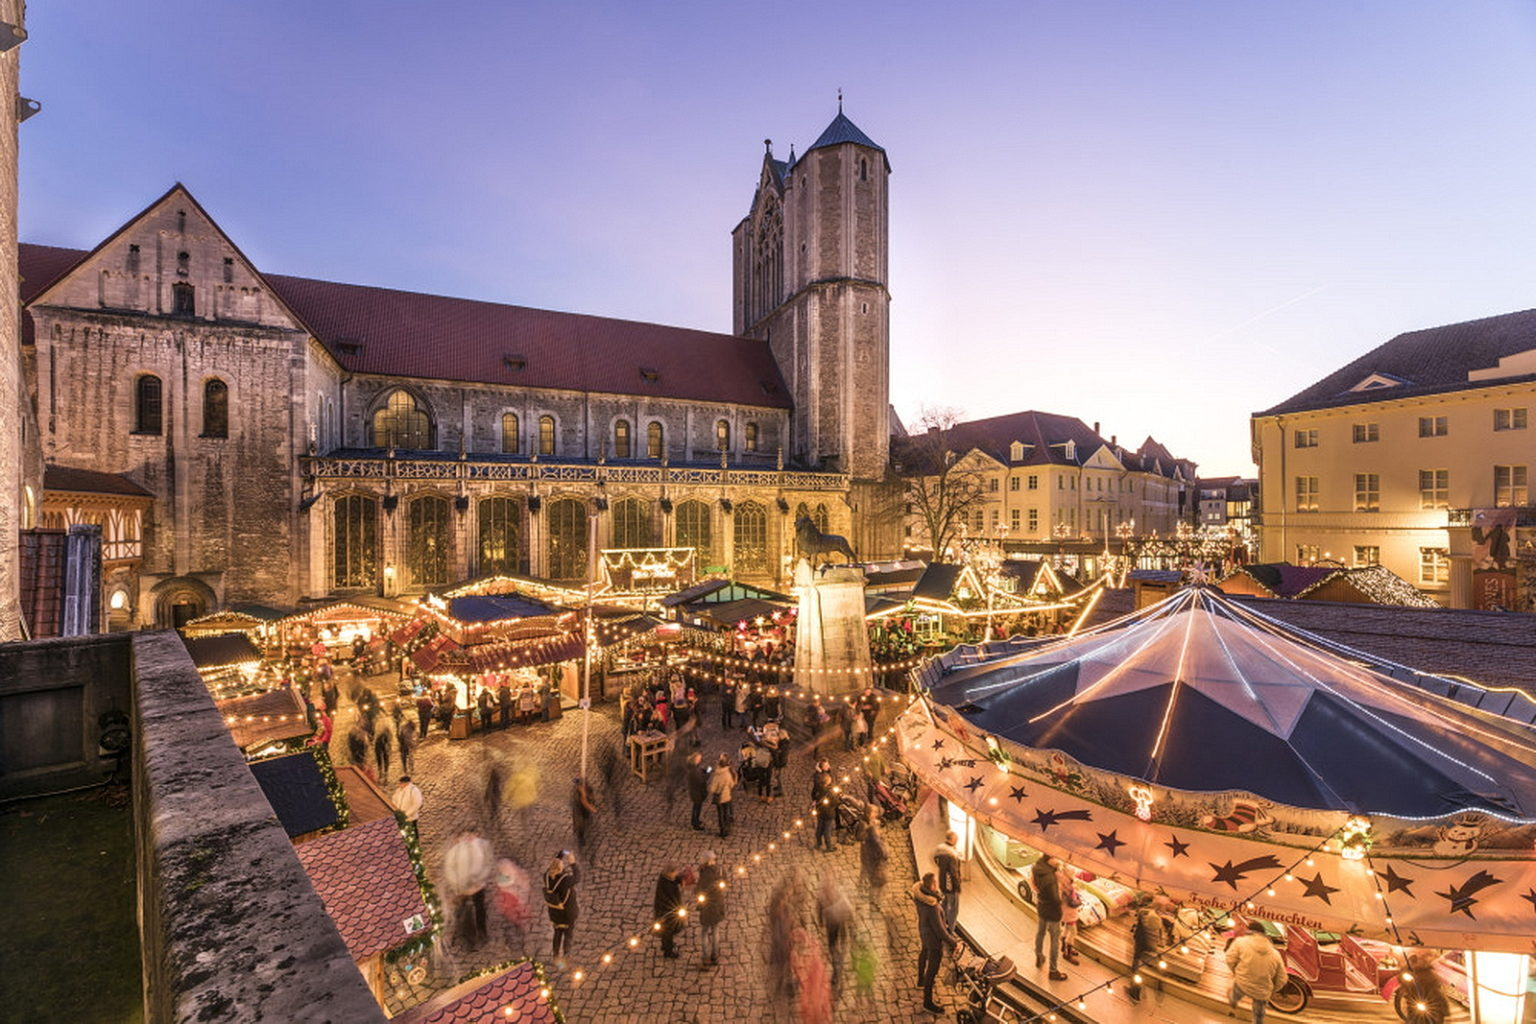 Tysk julemarked